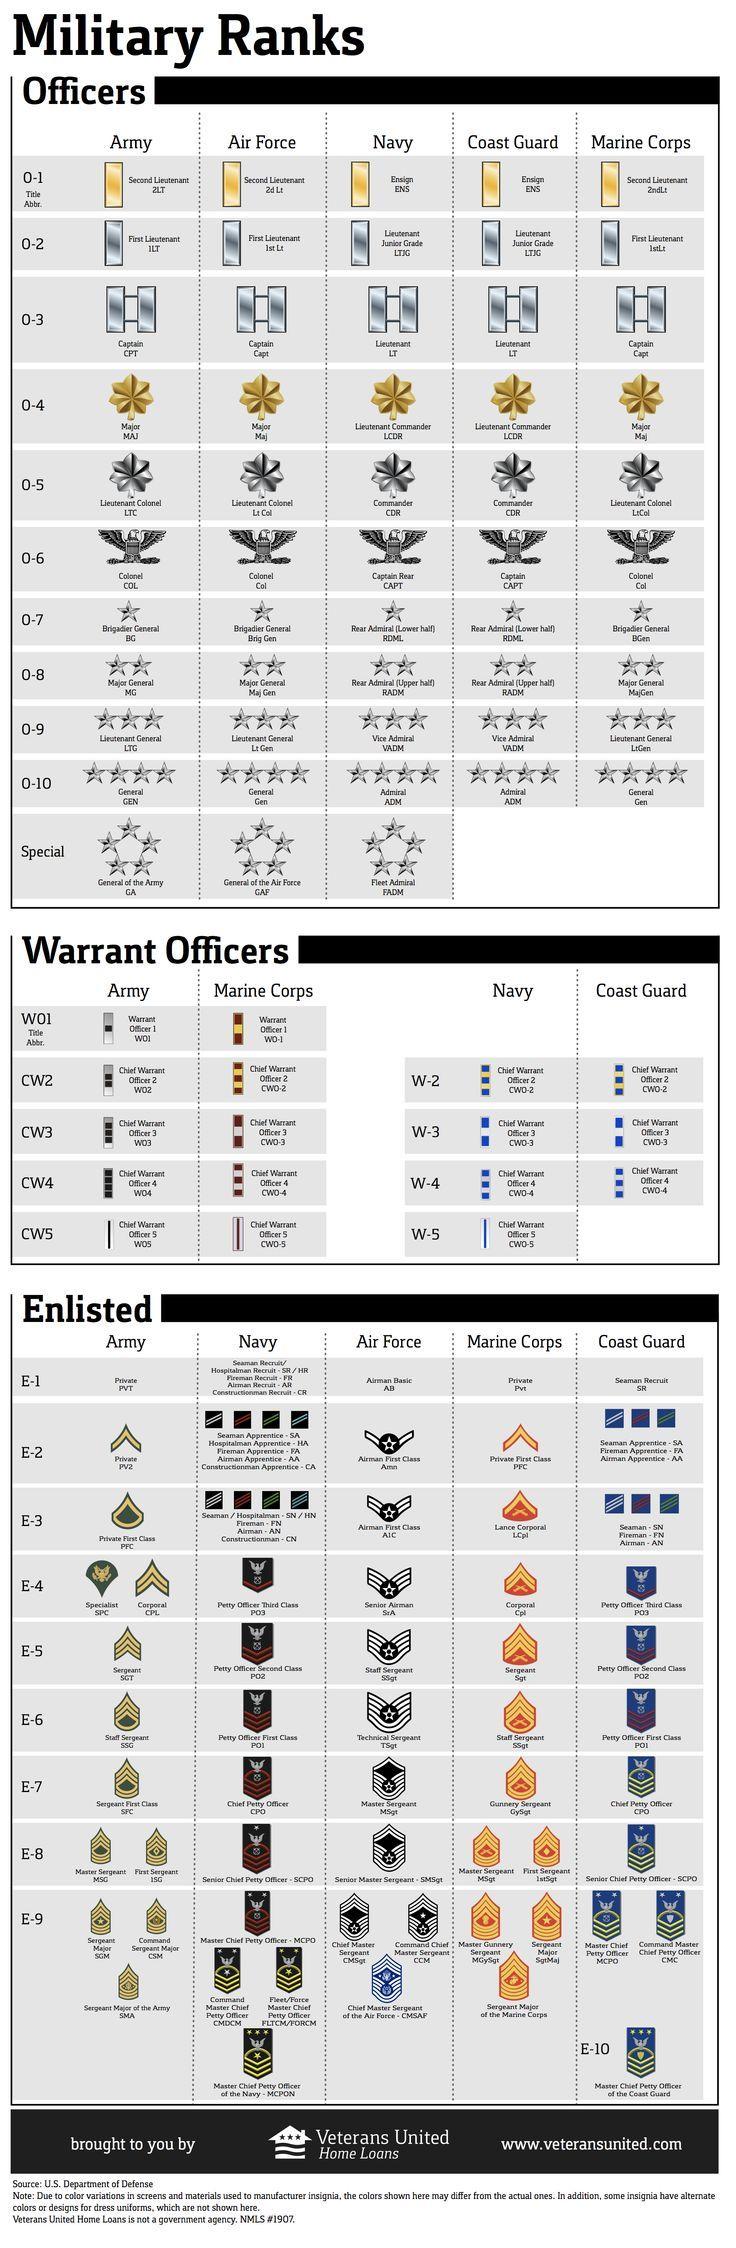 U.S military ranks